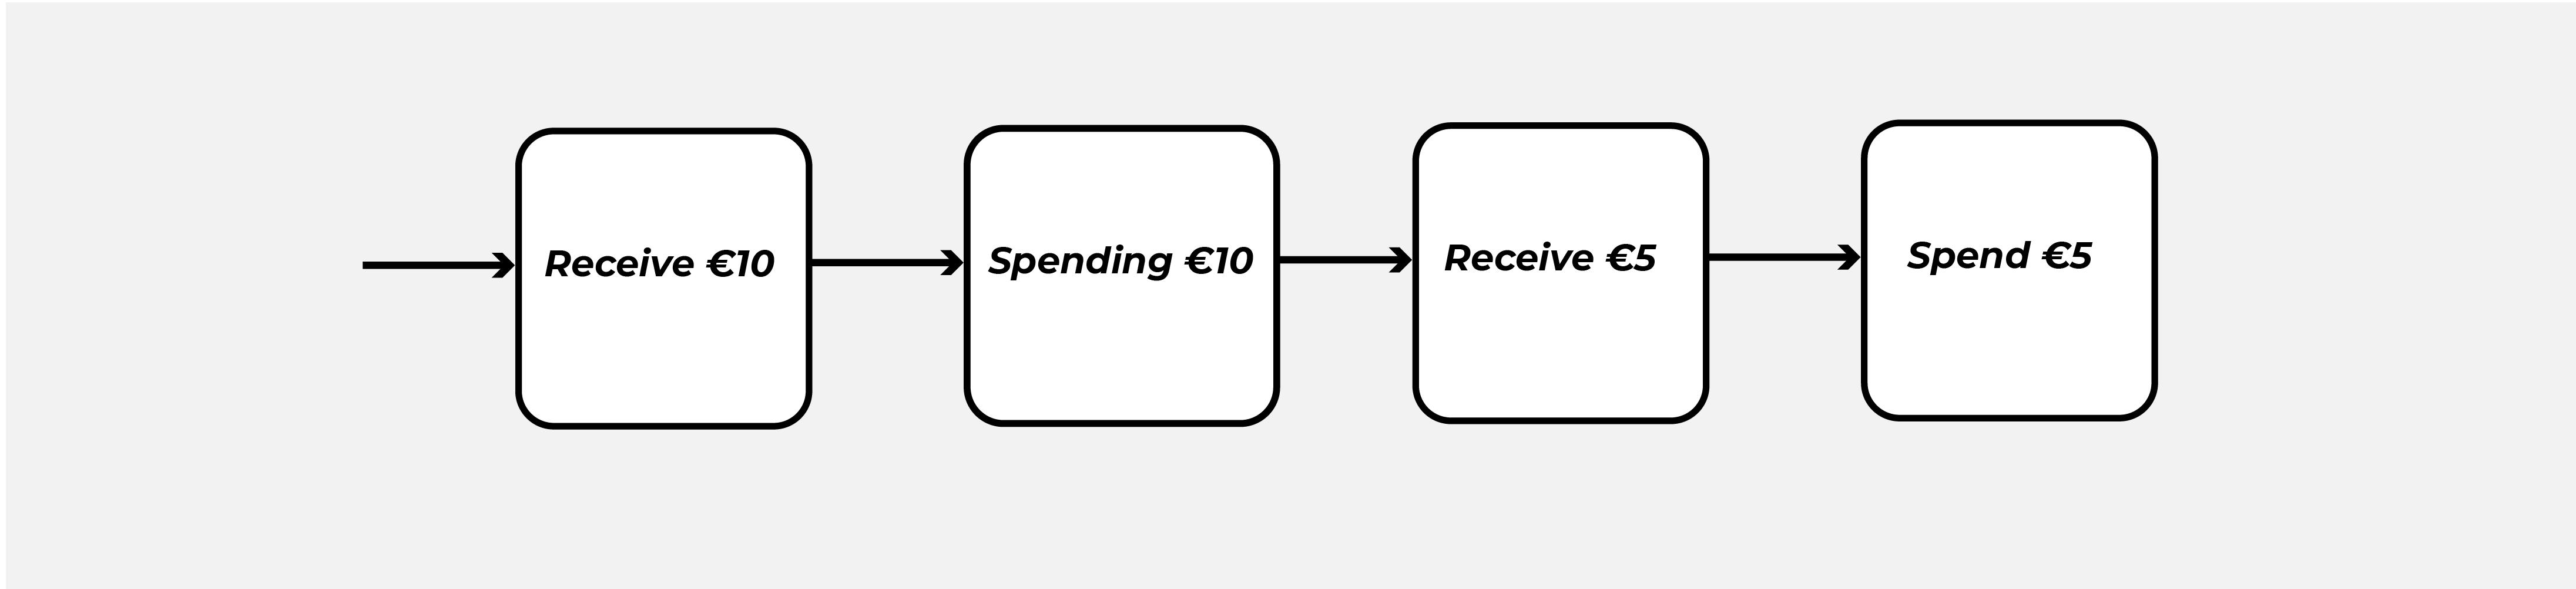 transaction-events